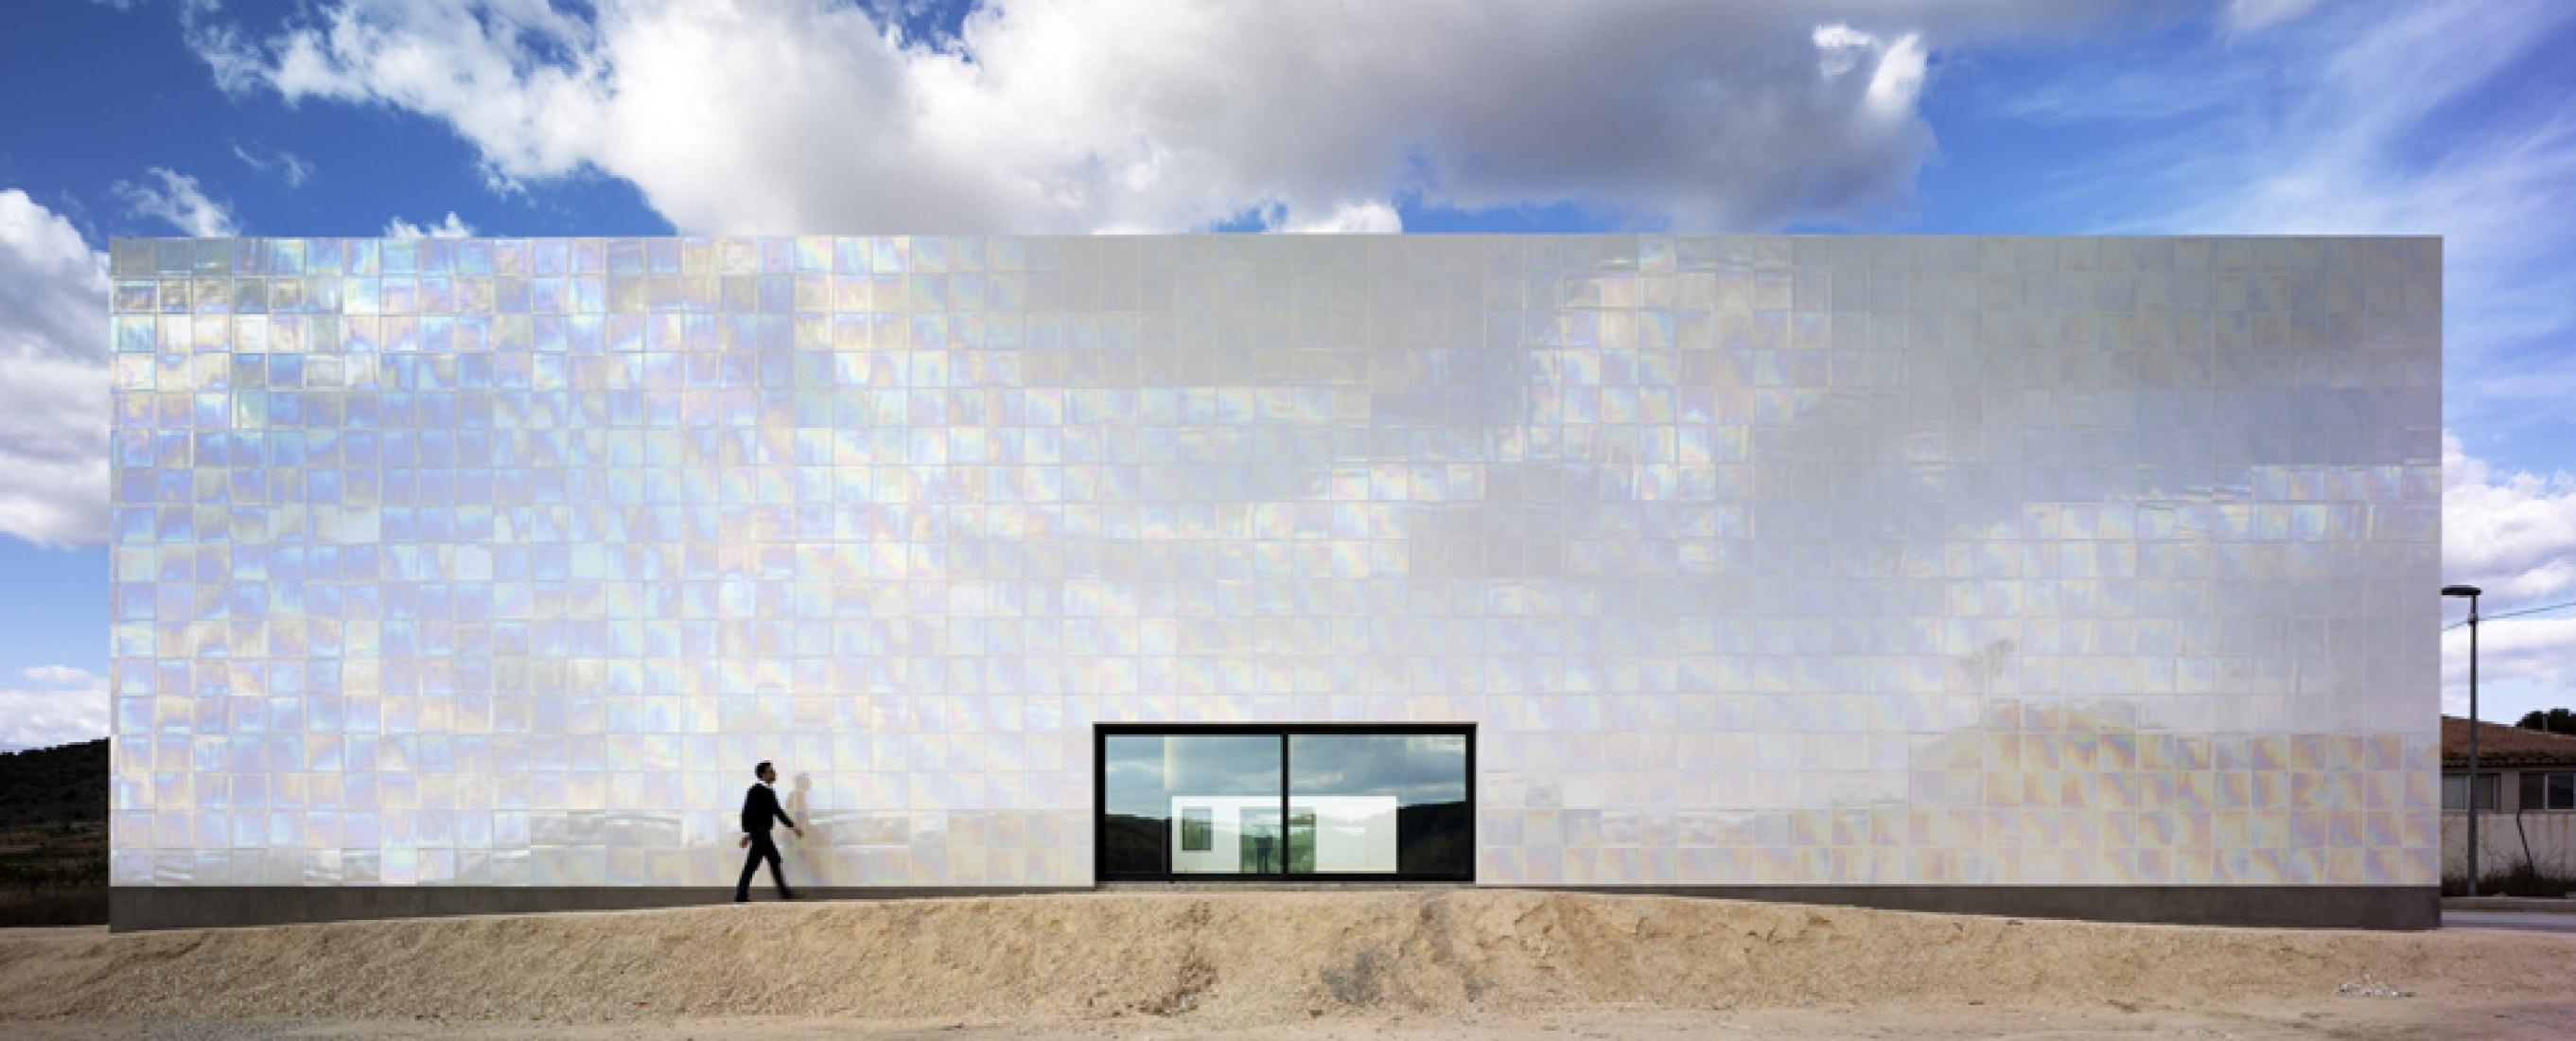 Alzado exterior. Fotografía © C O R  & Asociados.